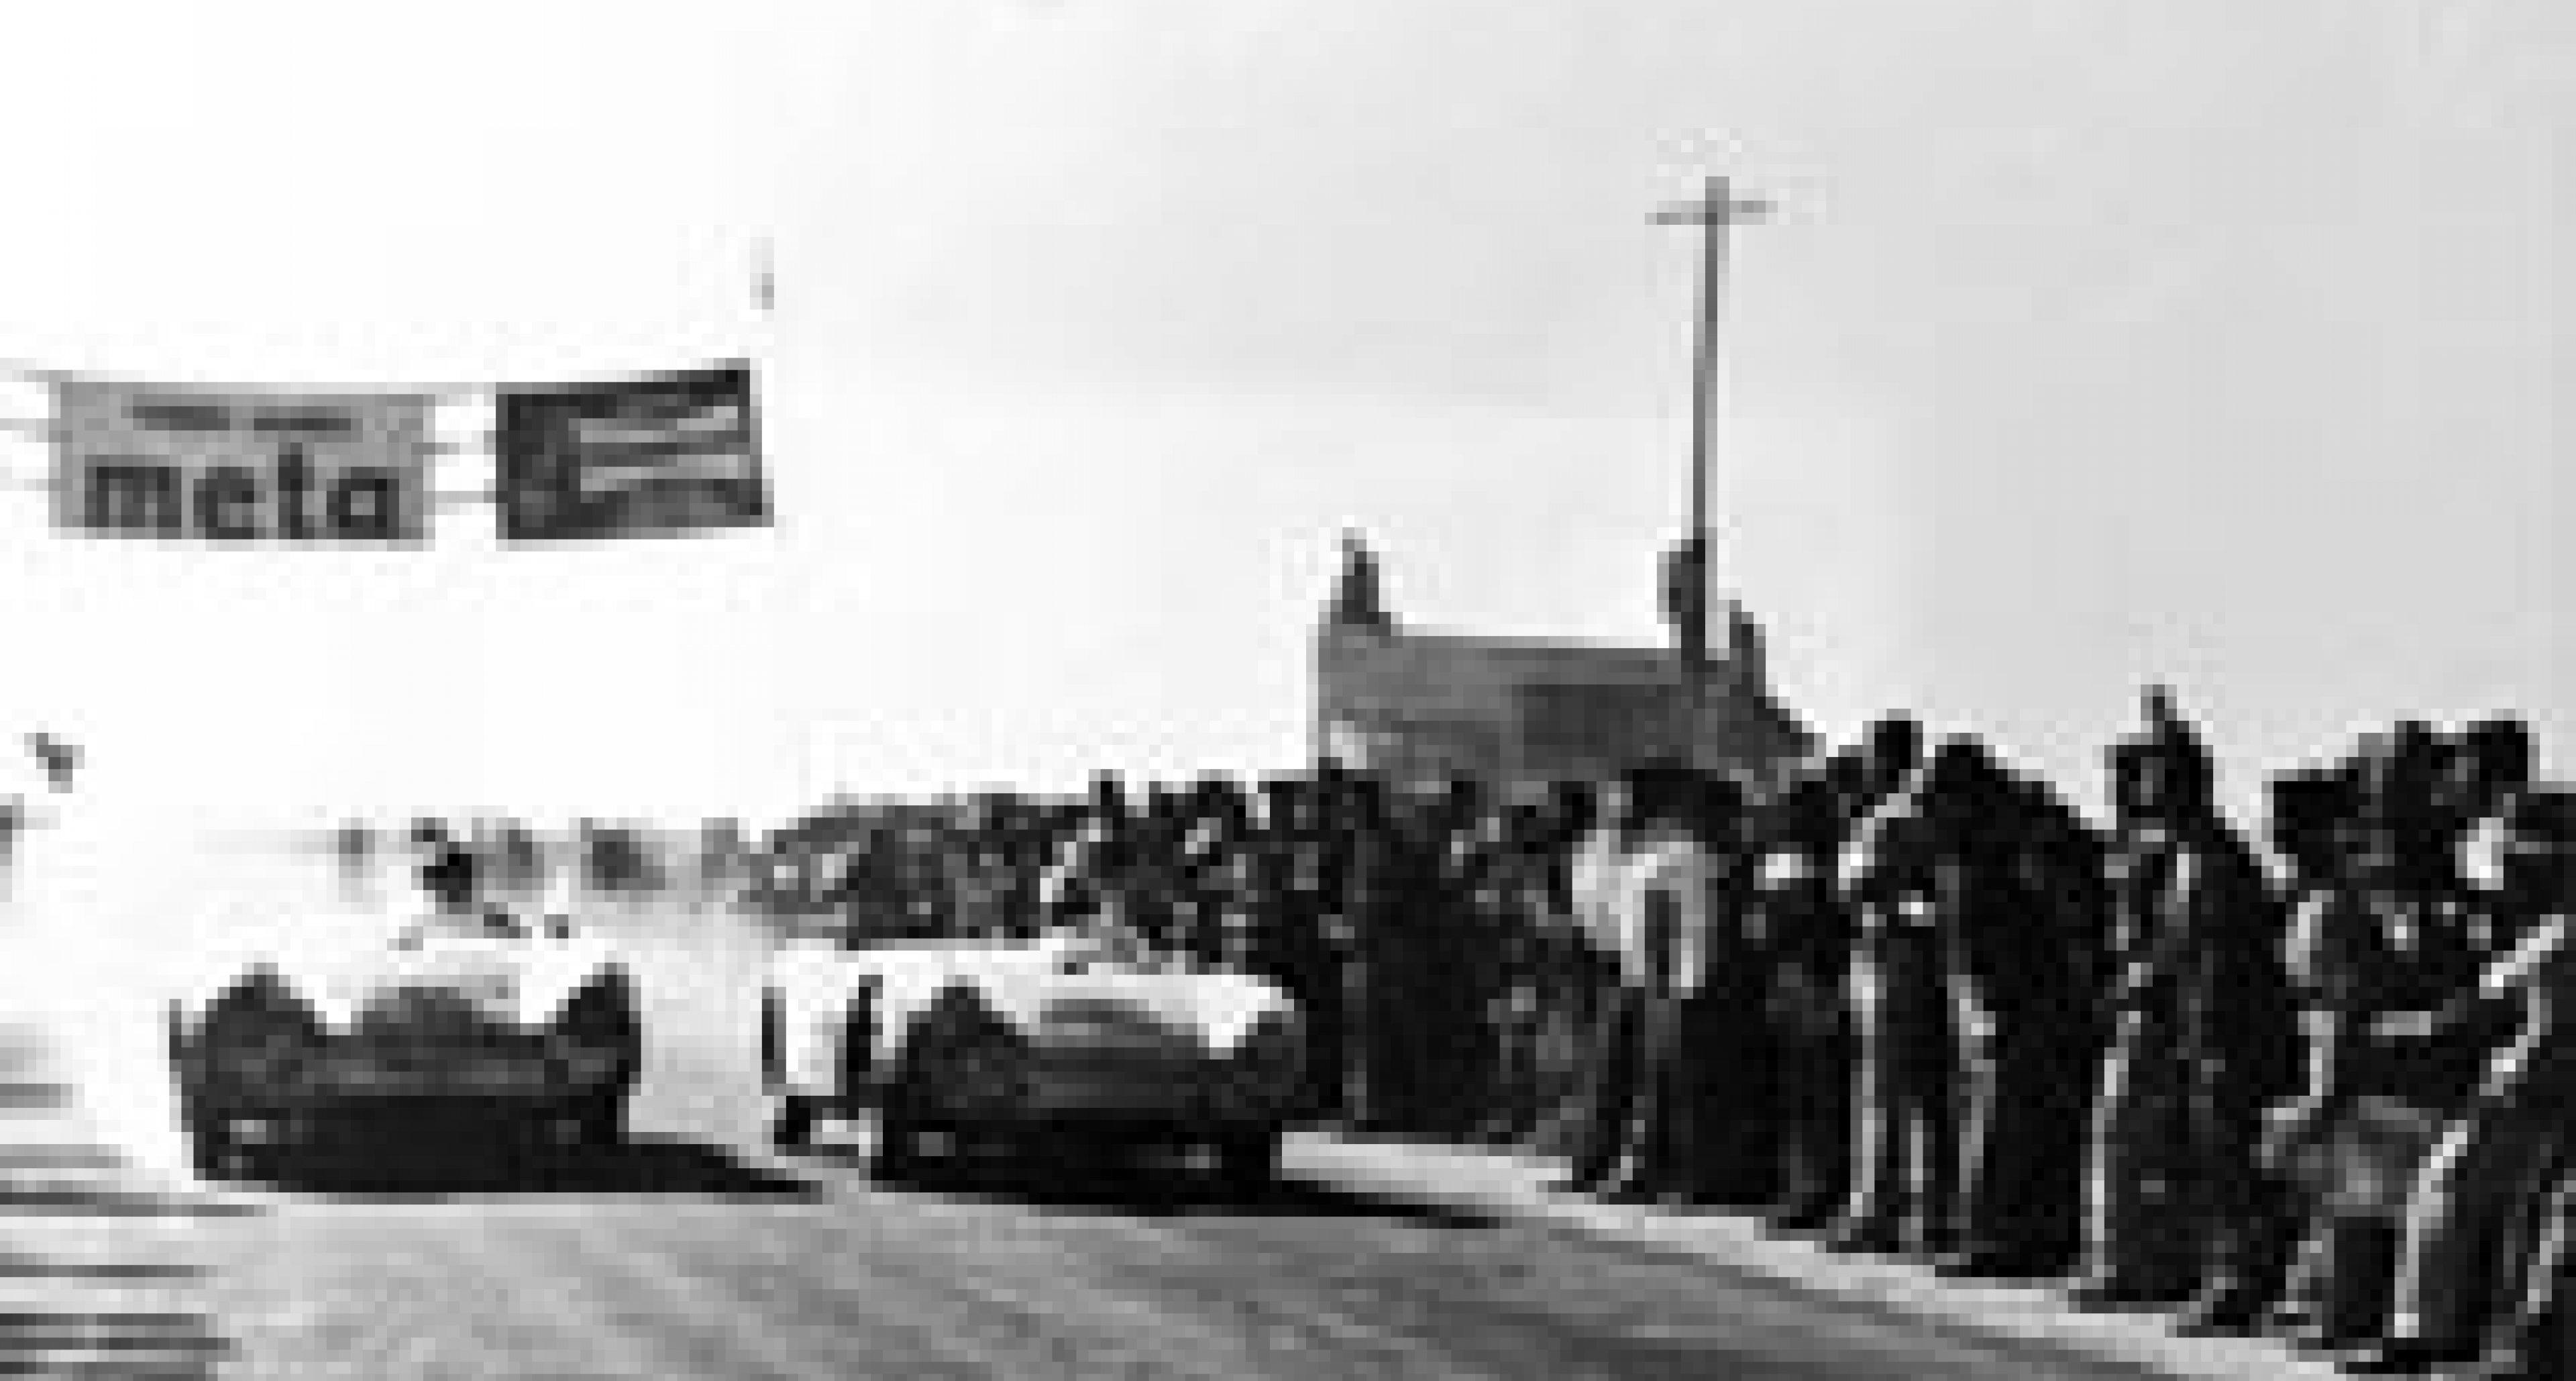 Porsche on the Carrera Panamericana